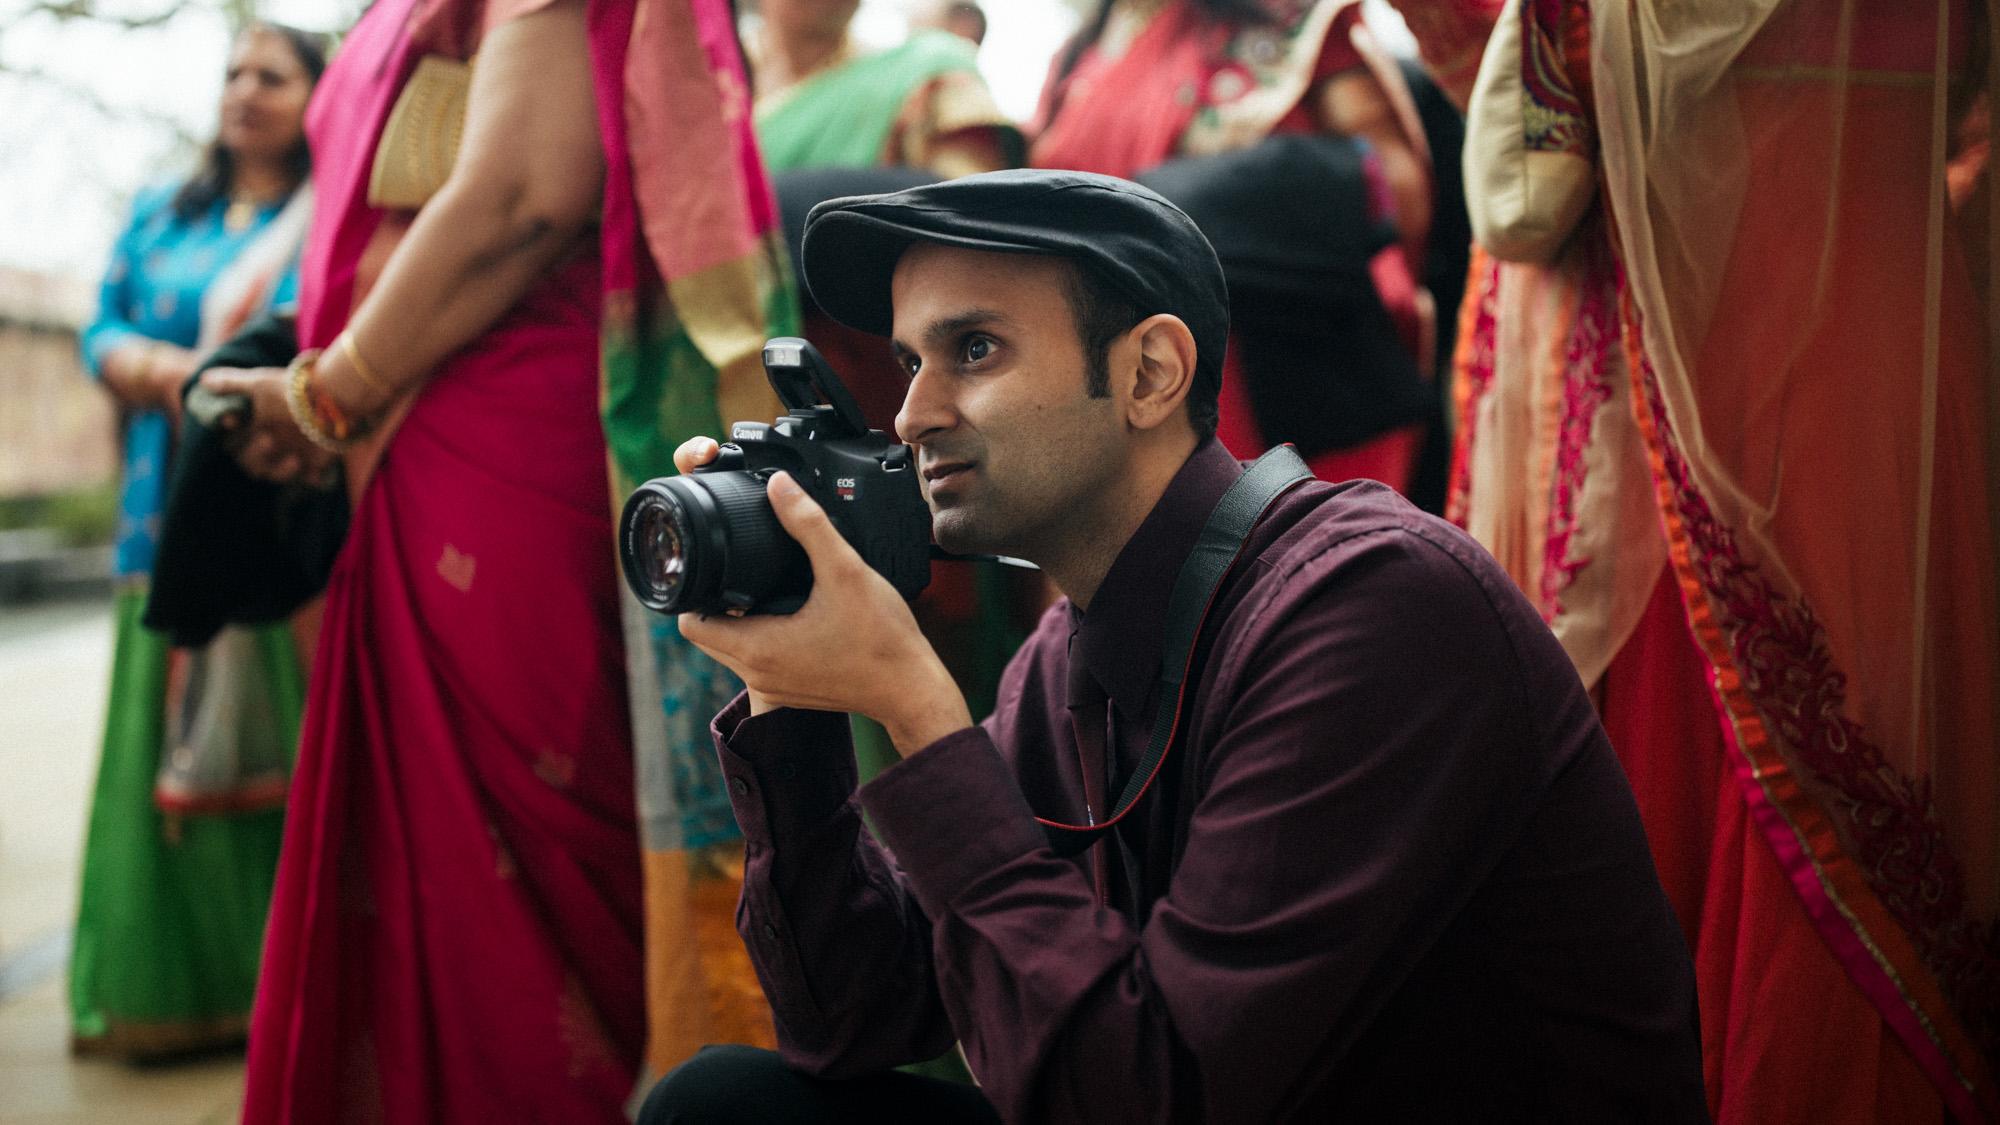 anu_maneesh_alec_vanderboom_Indian_wedding_photography-0020.jpg